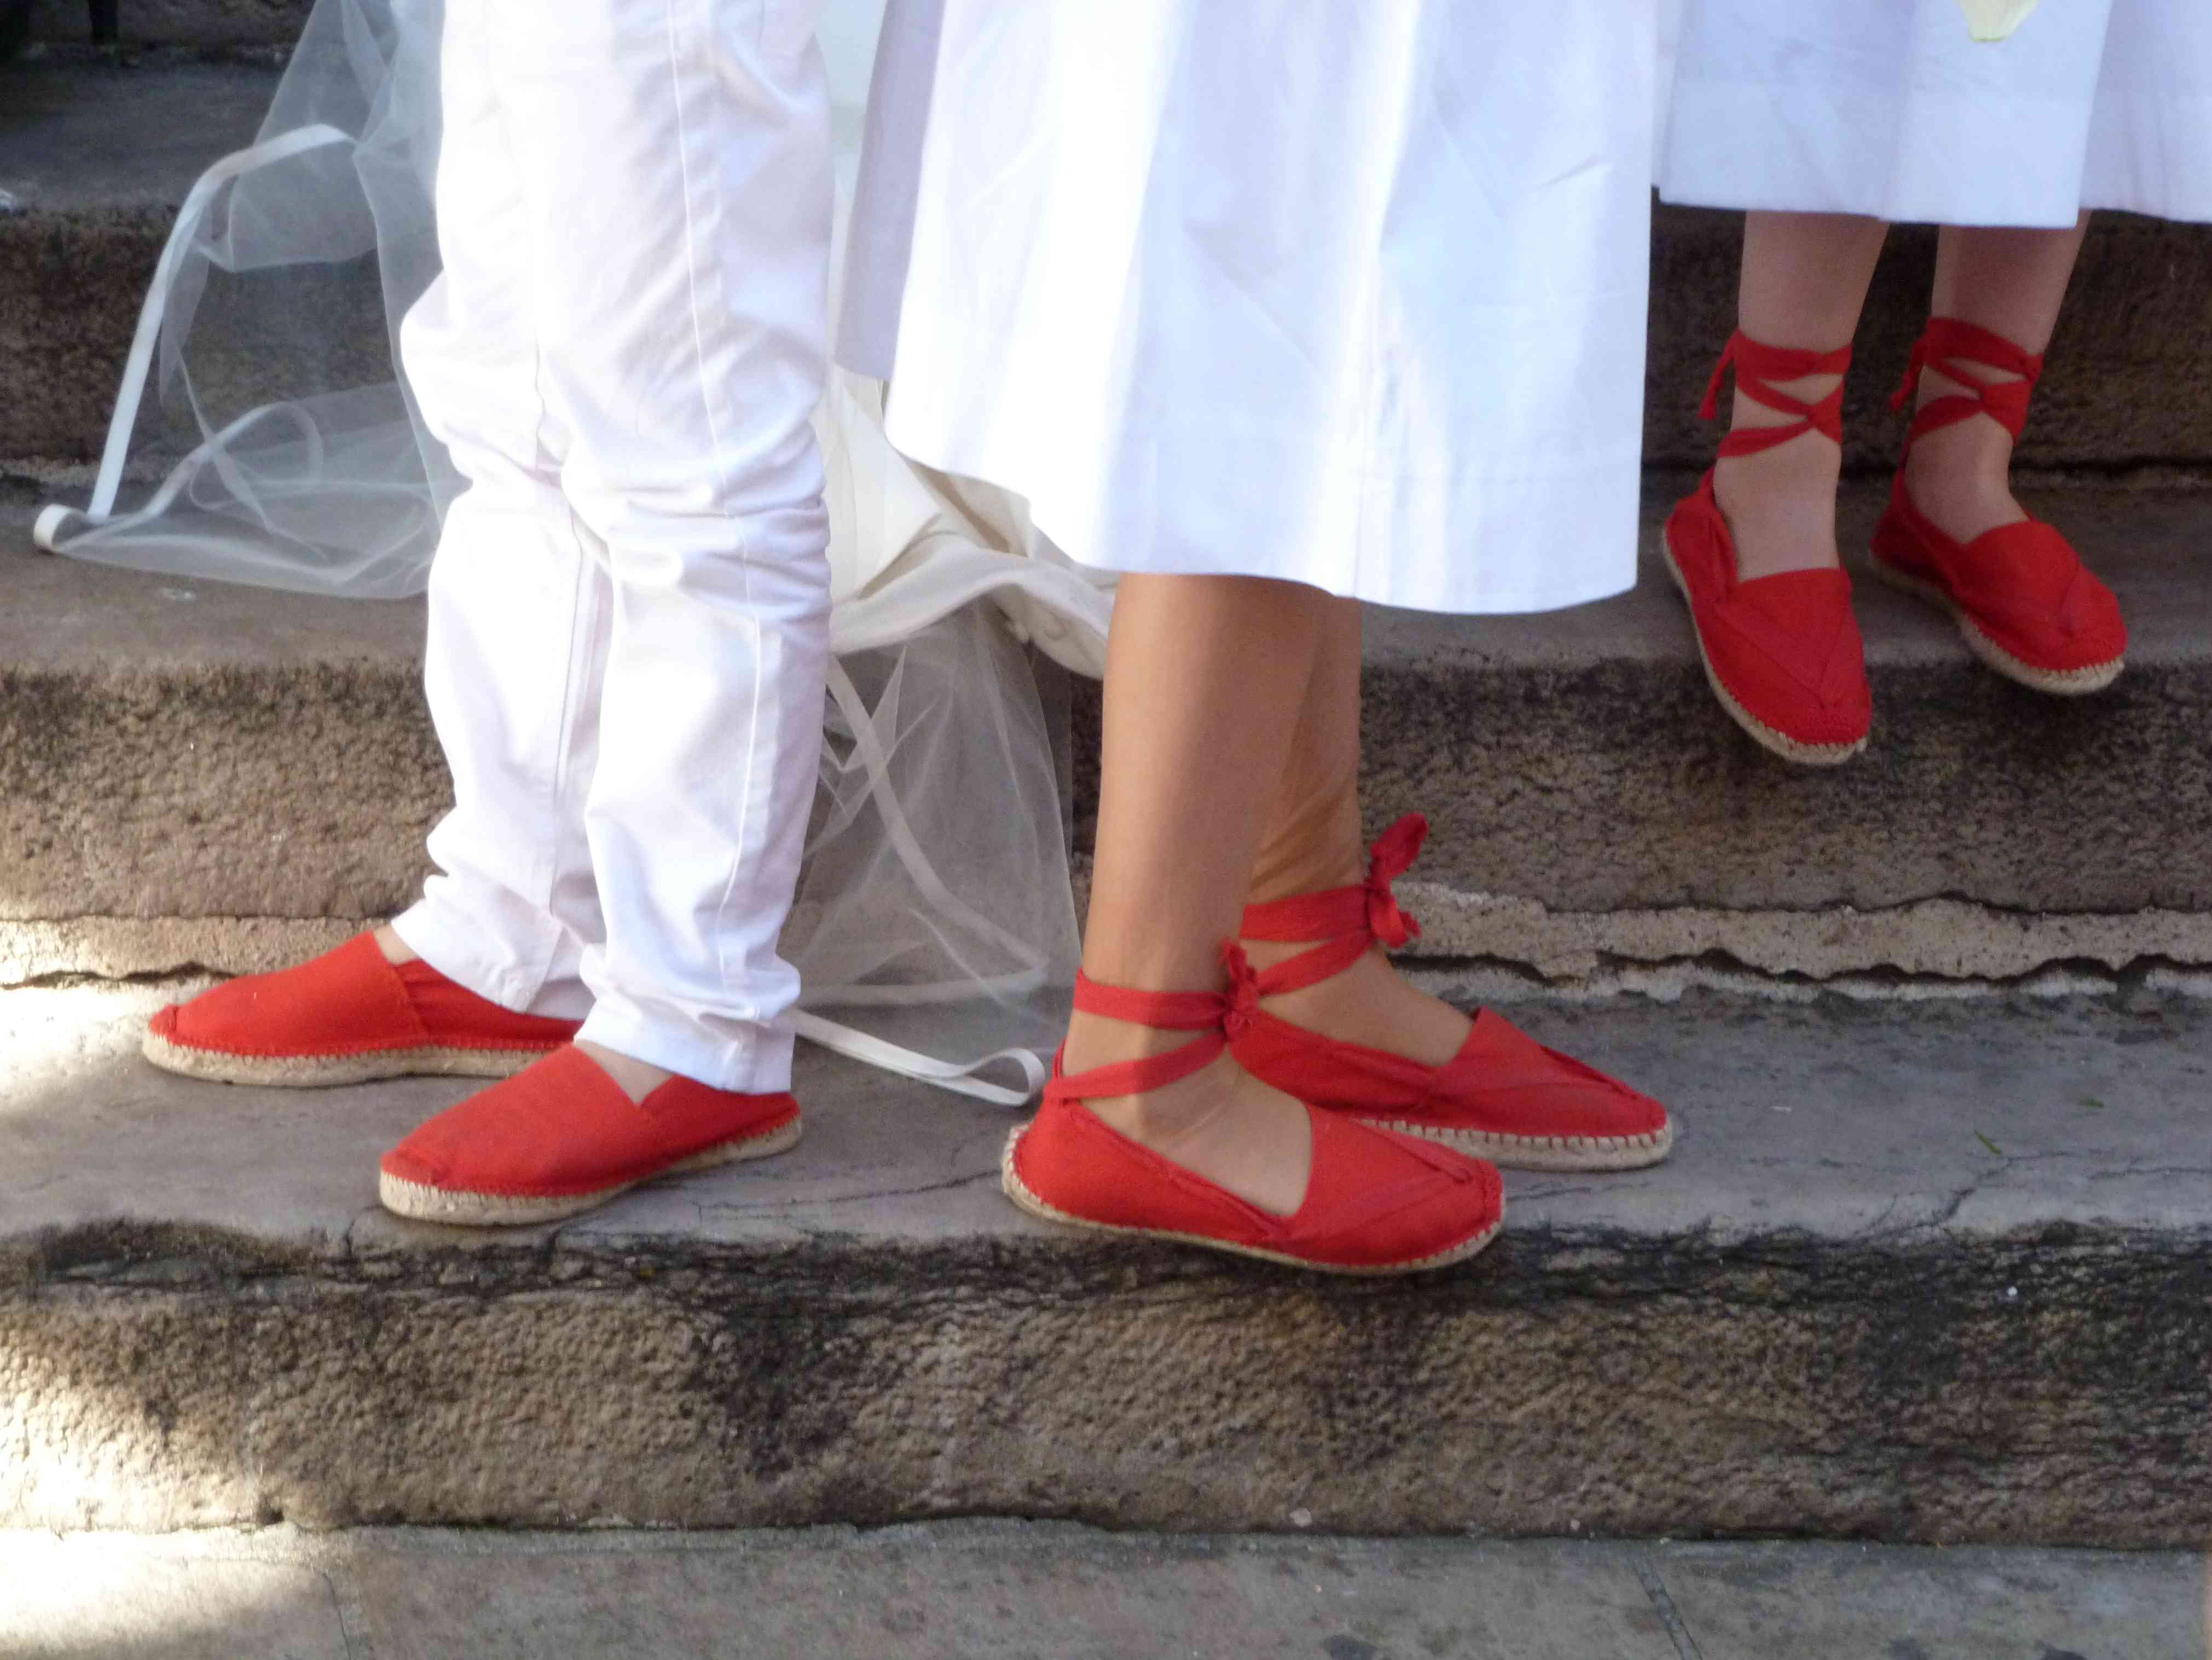 Mariage basque 10-2013 espadrilles rouges